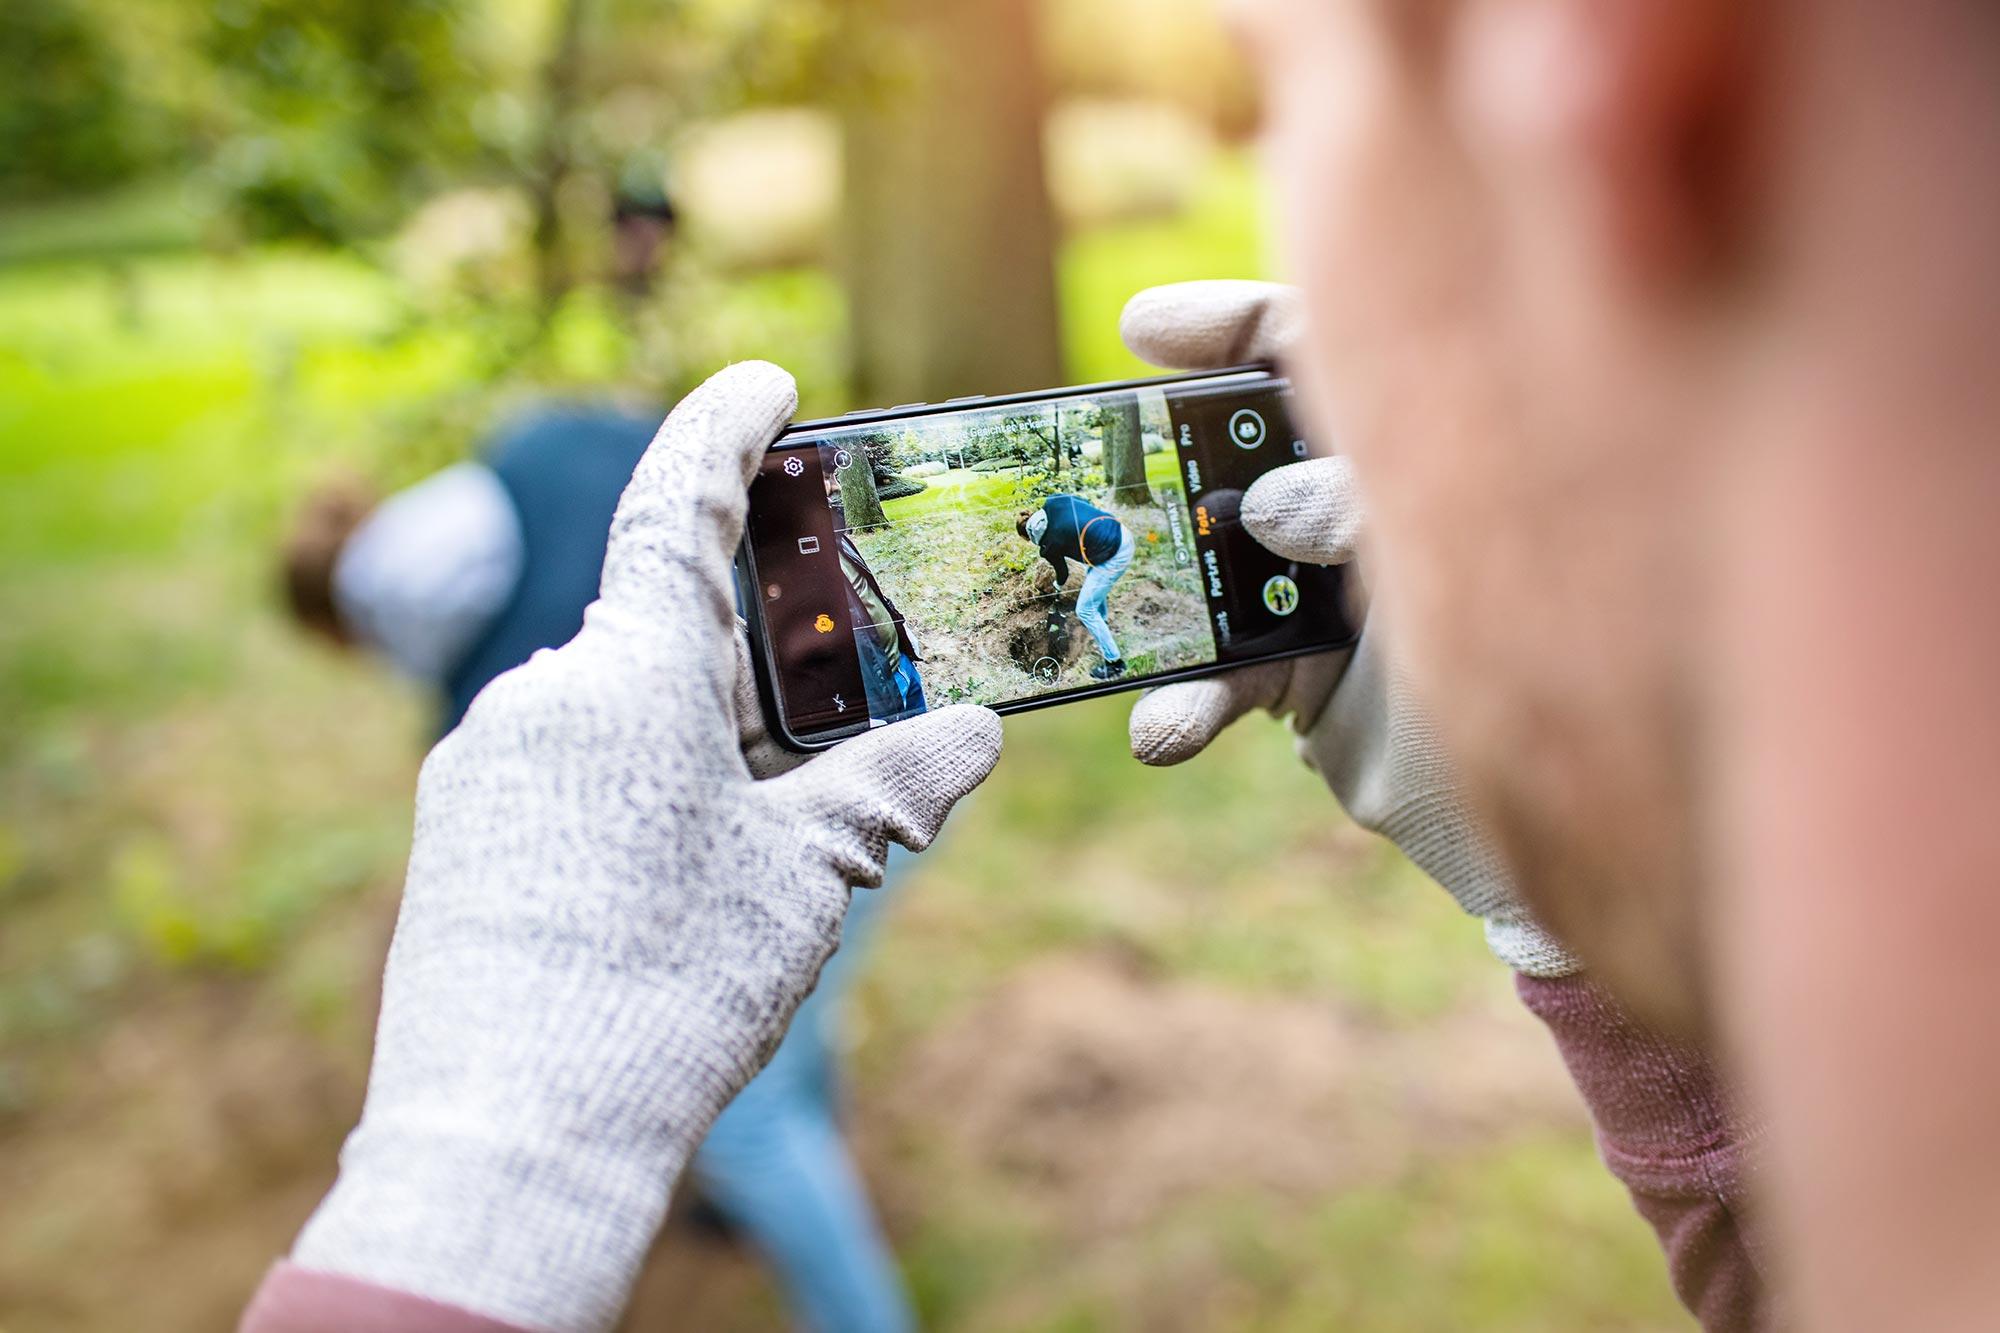 Santiago Advisors Beratungsagentur Imagemotive Baumpflanzen im Wald Project Zero Natur Smartphone